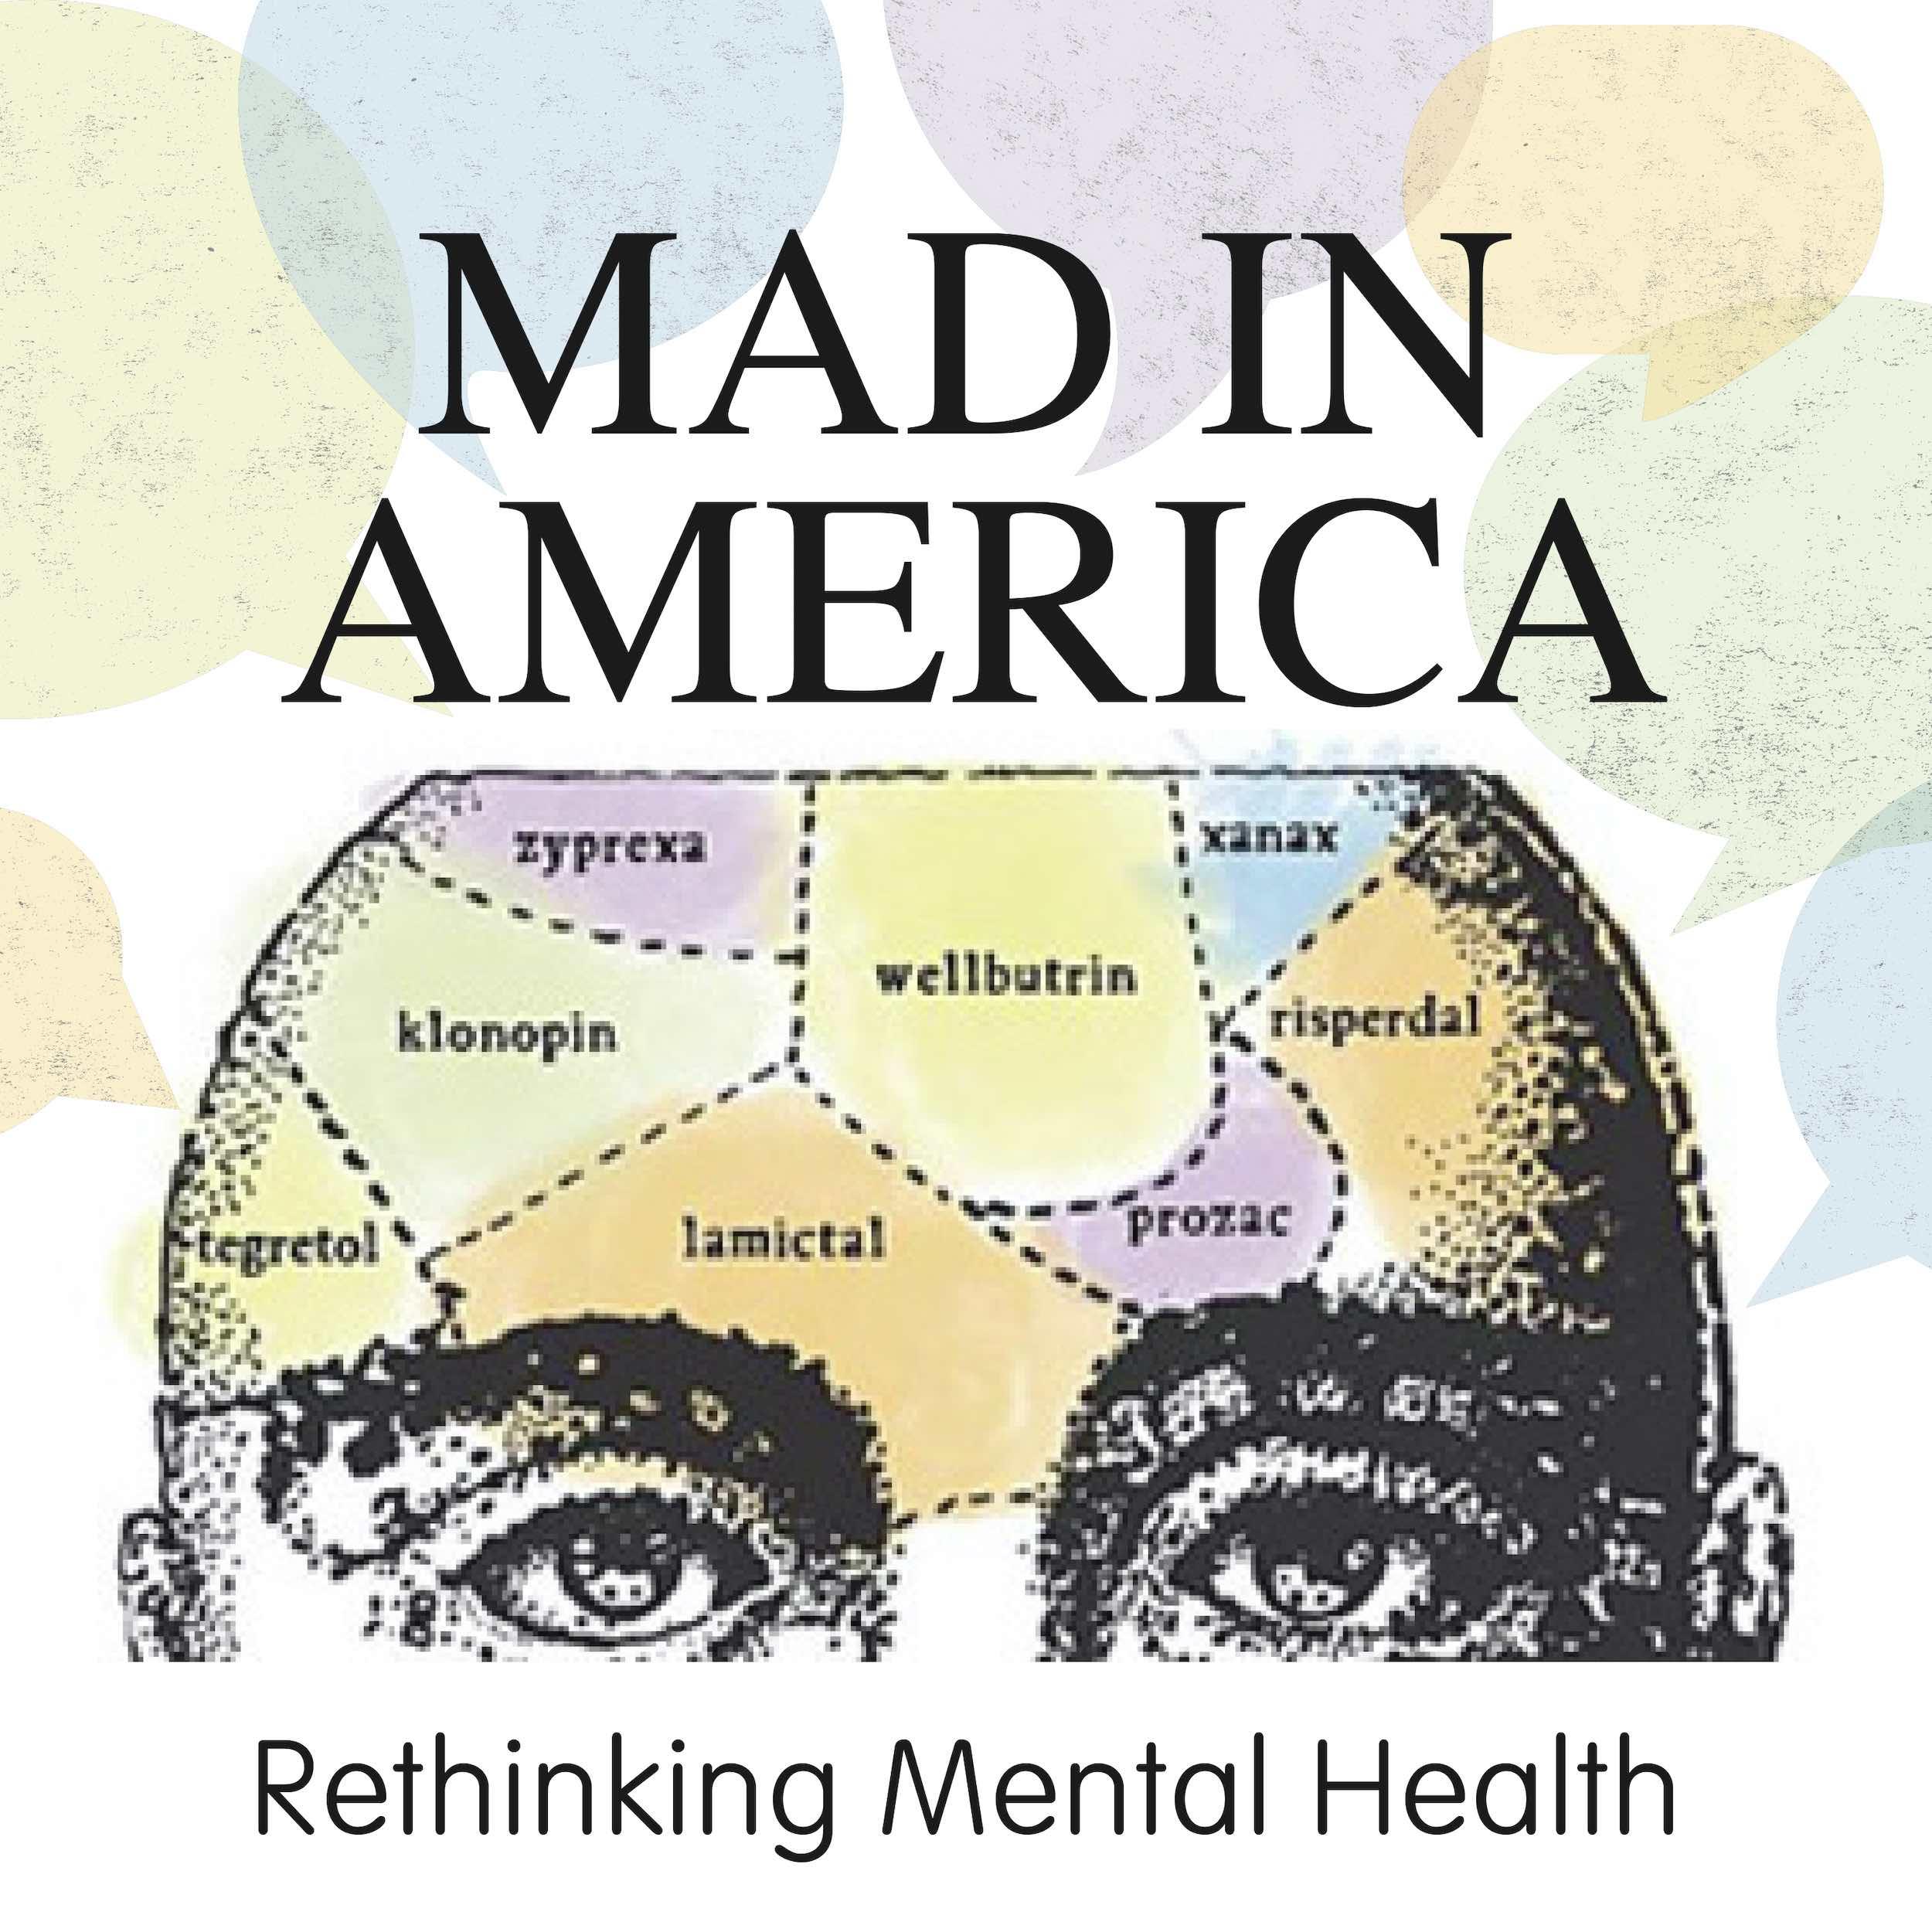 Mad in America: Rethinking Mental Health - Angela Peacock - Medicating Normal